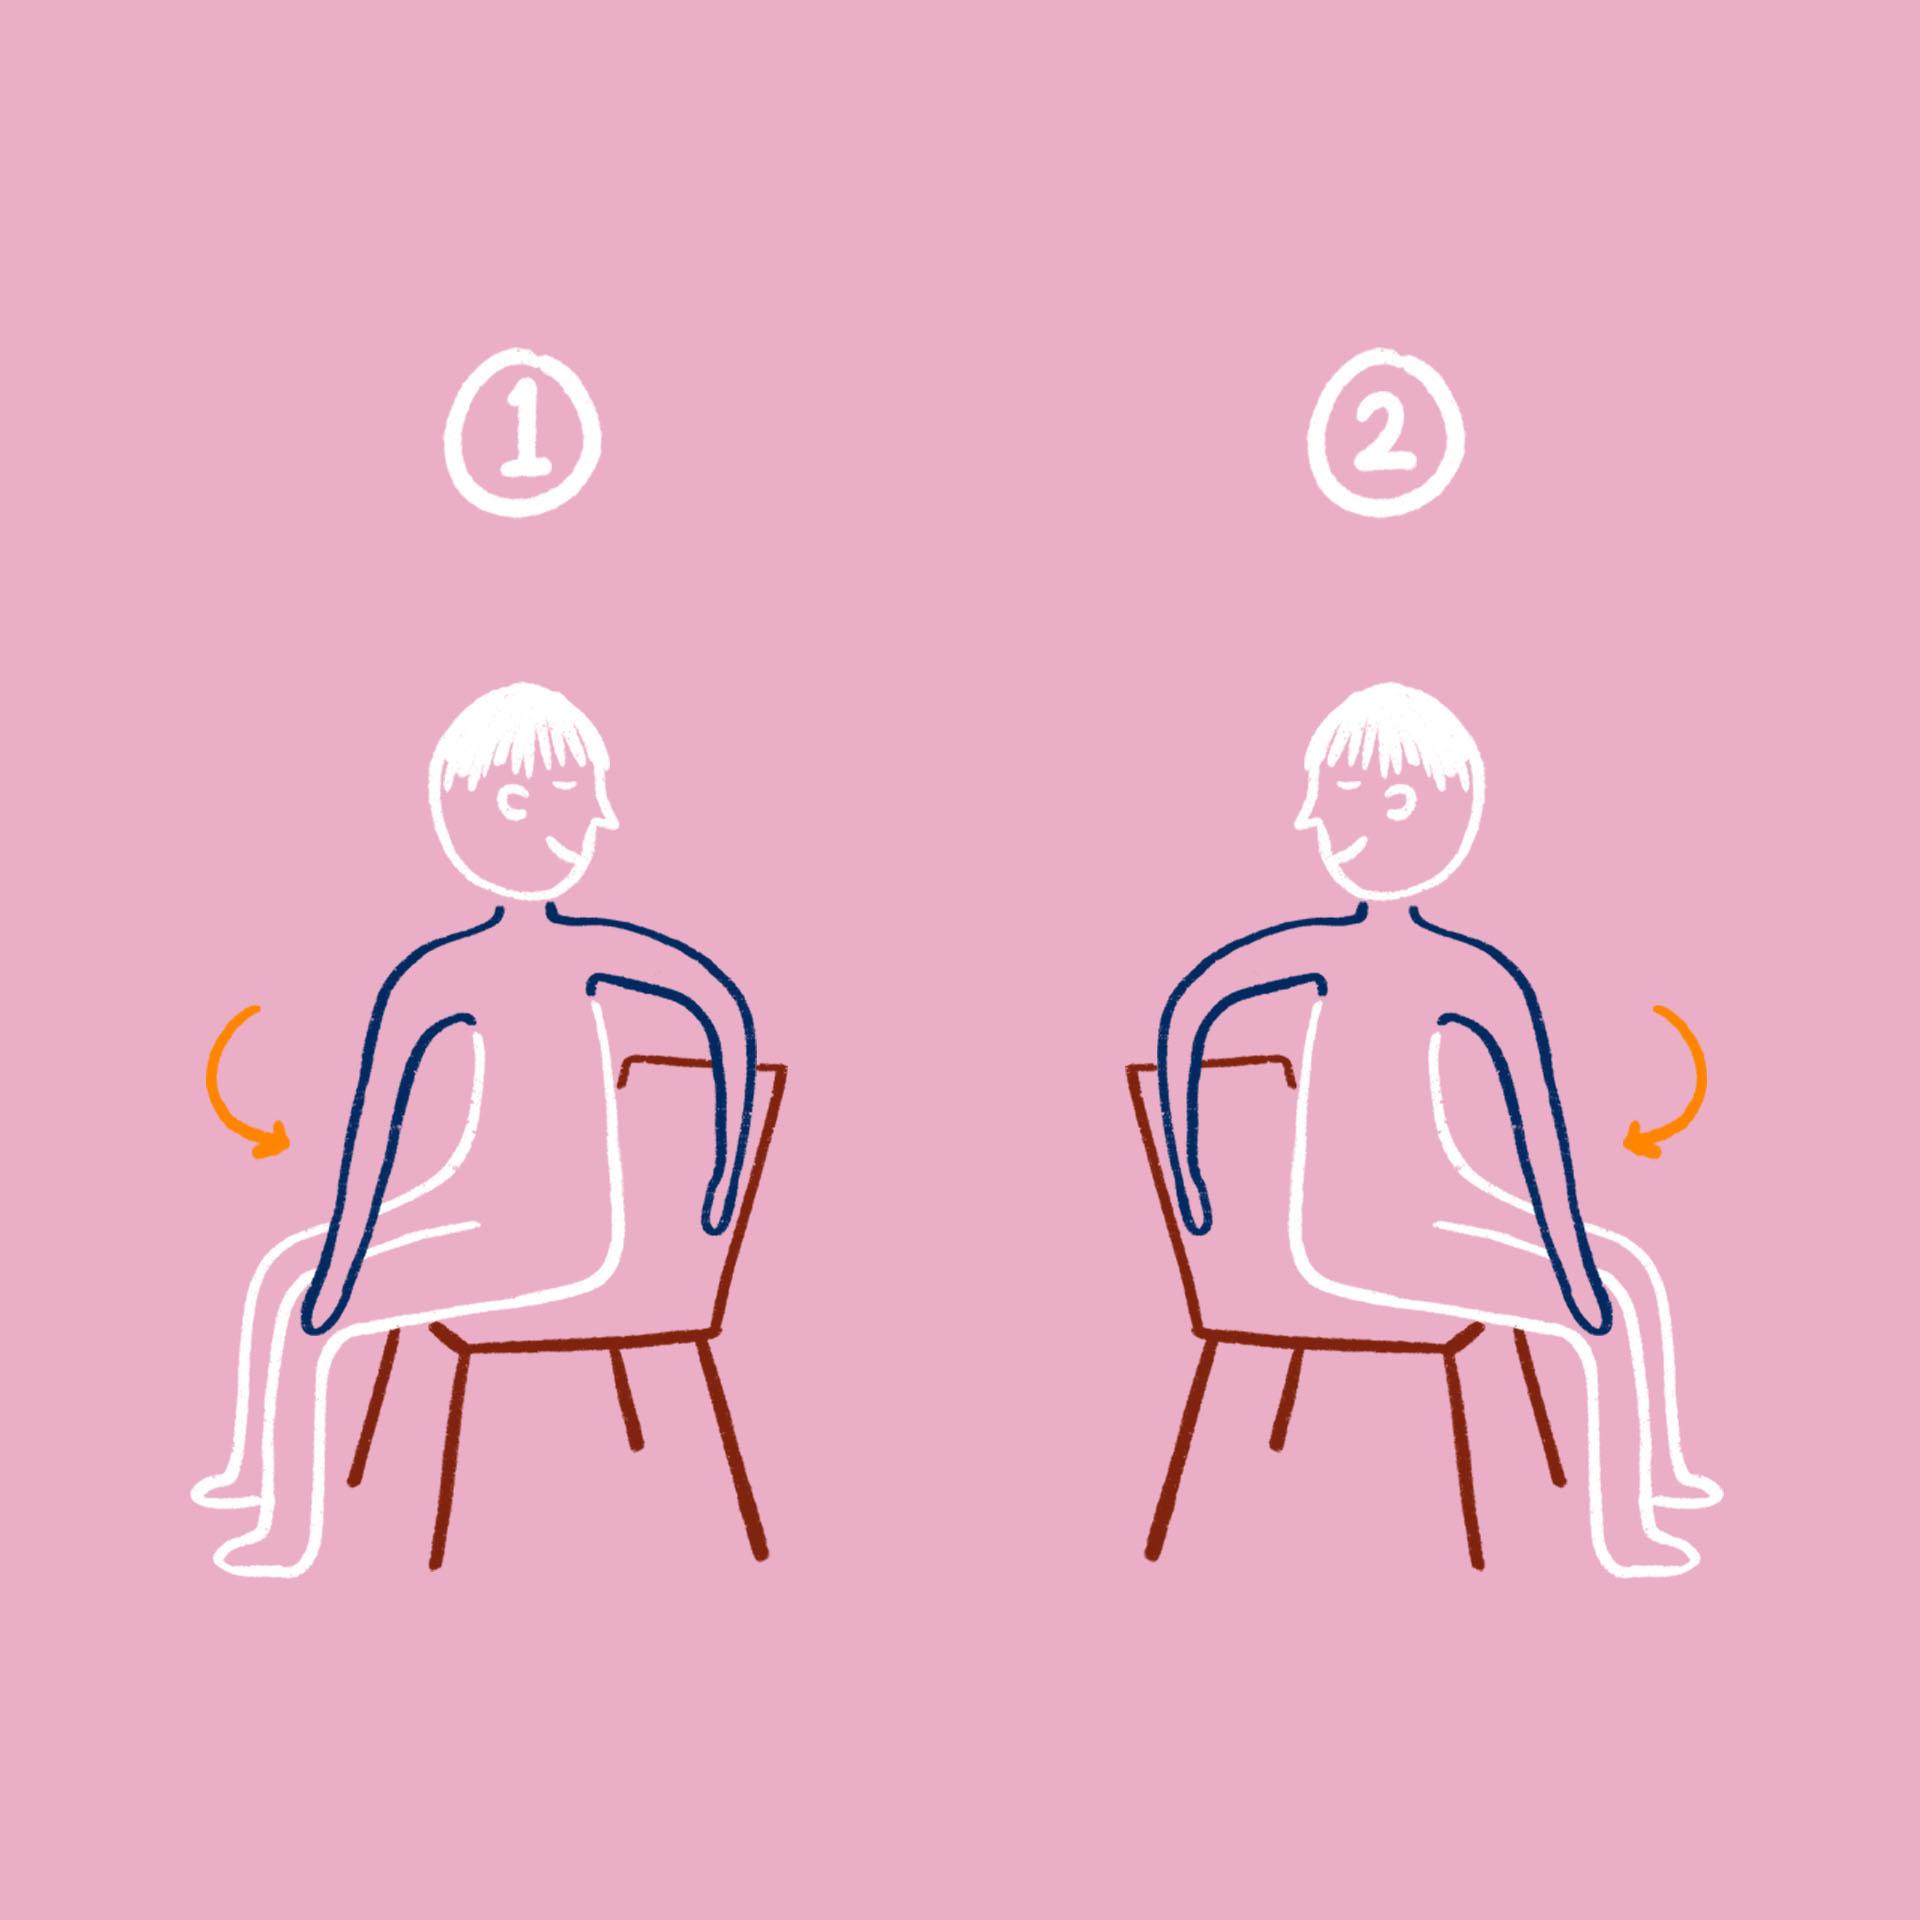 stretch-illustrations_v03b05-Spinal Twist.jpg